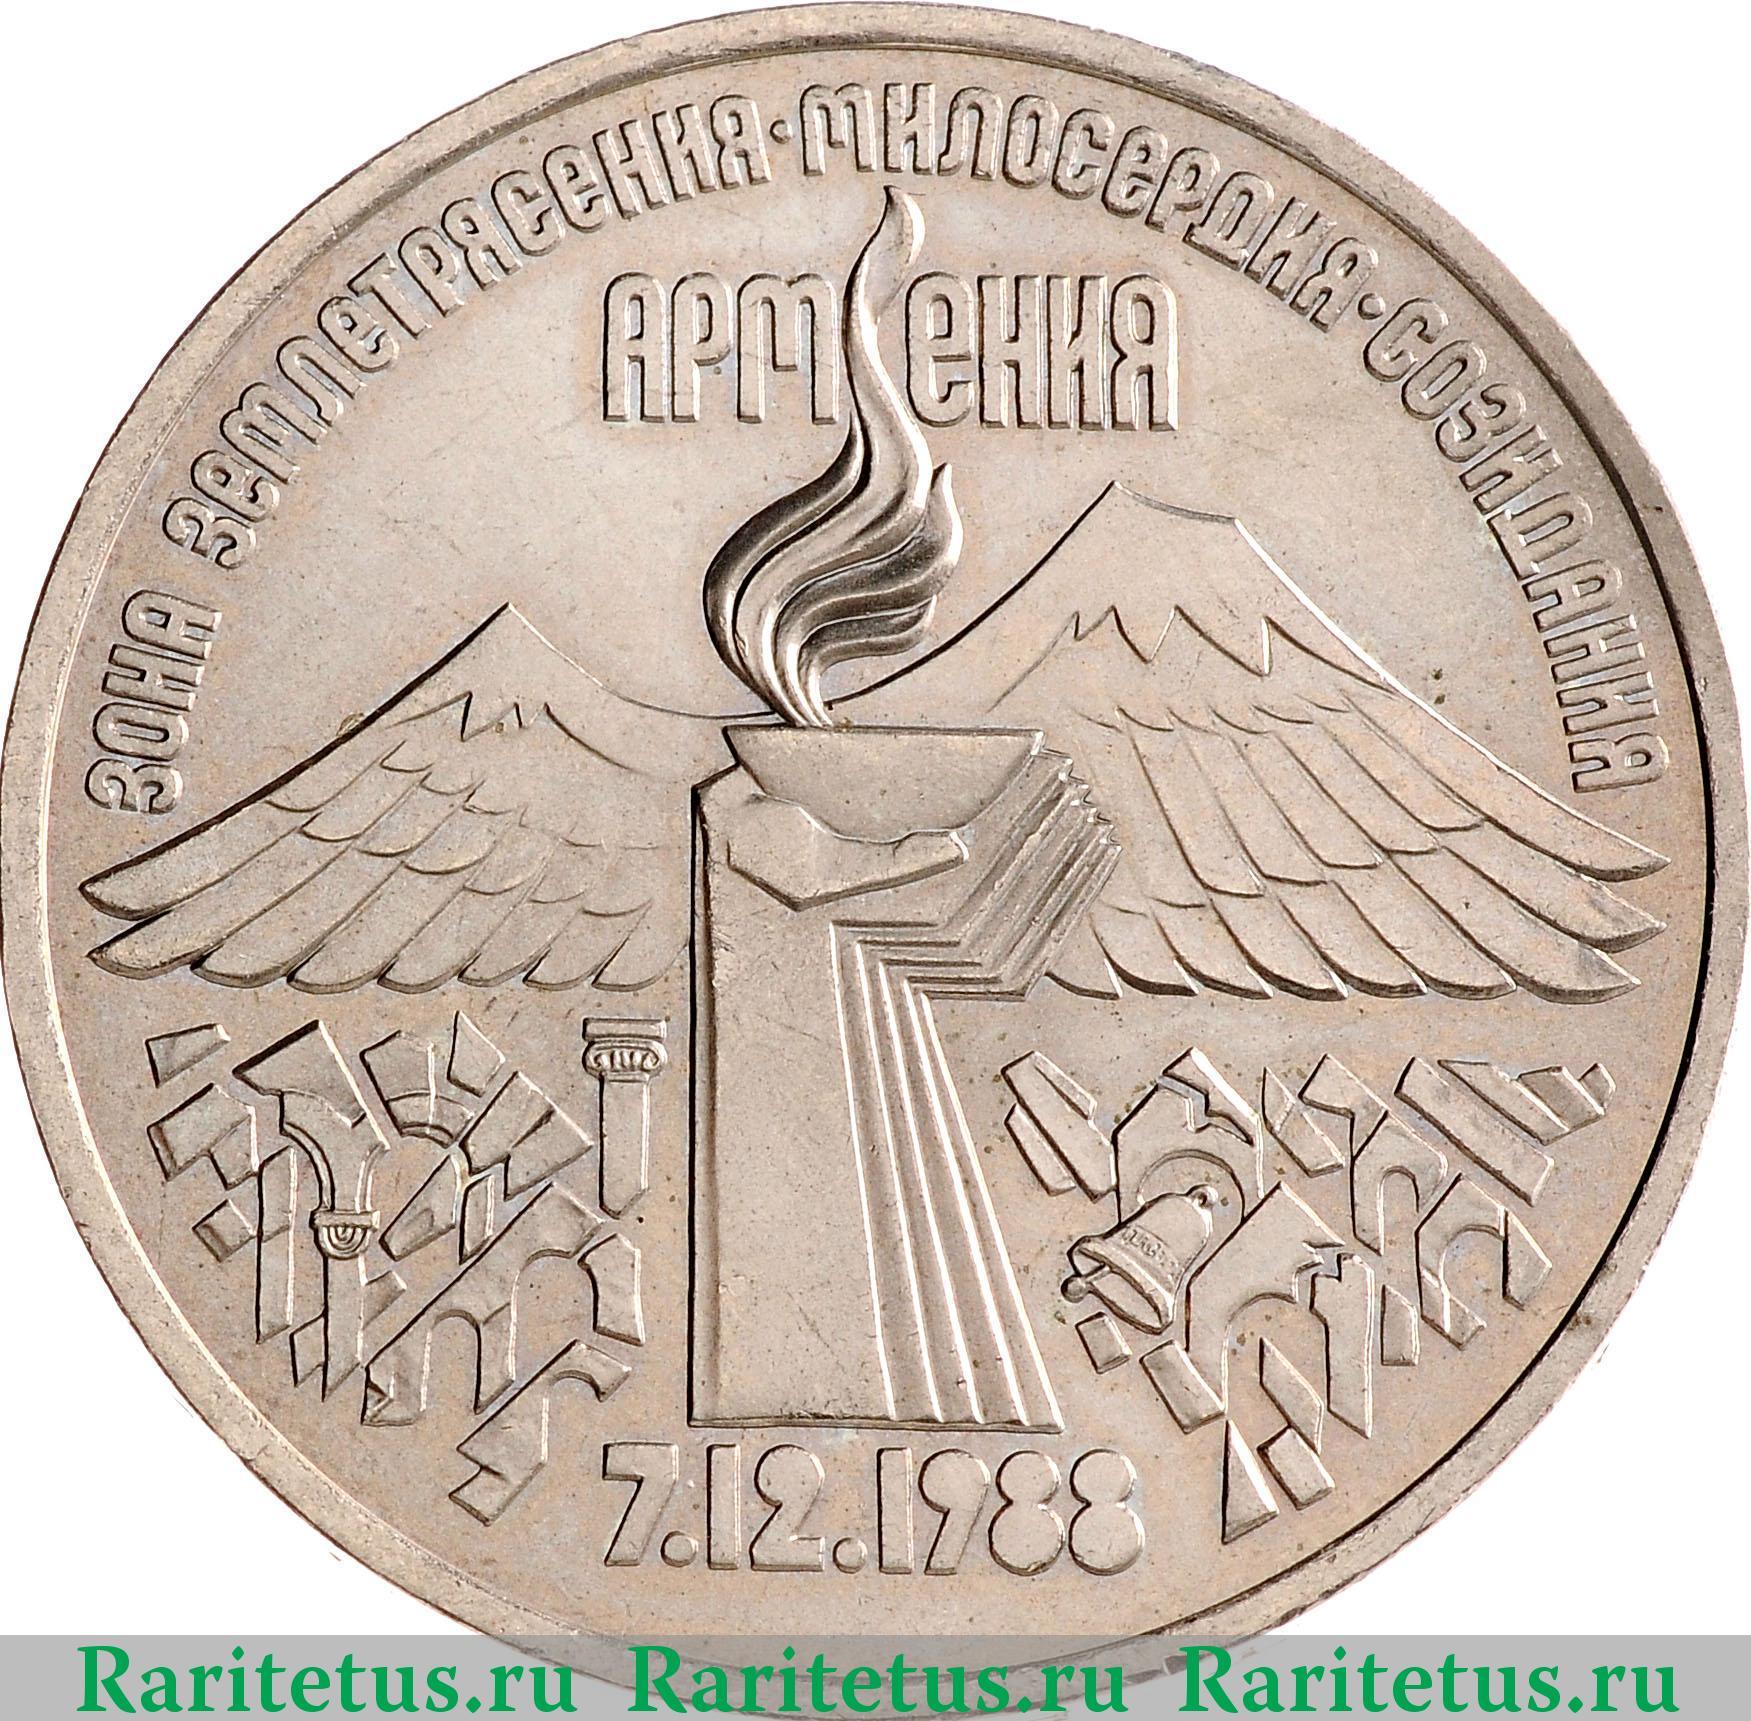 Монета сто лет геноцида армян купить банкноты бразилии каталог